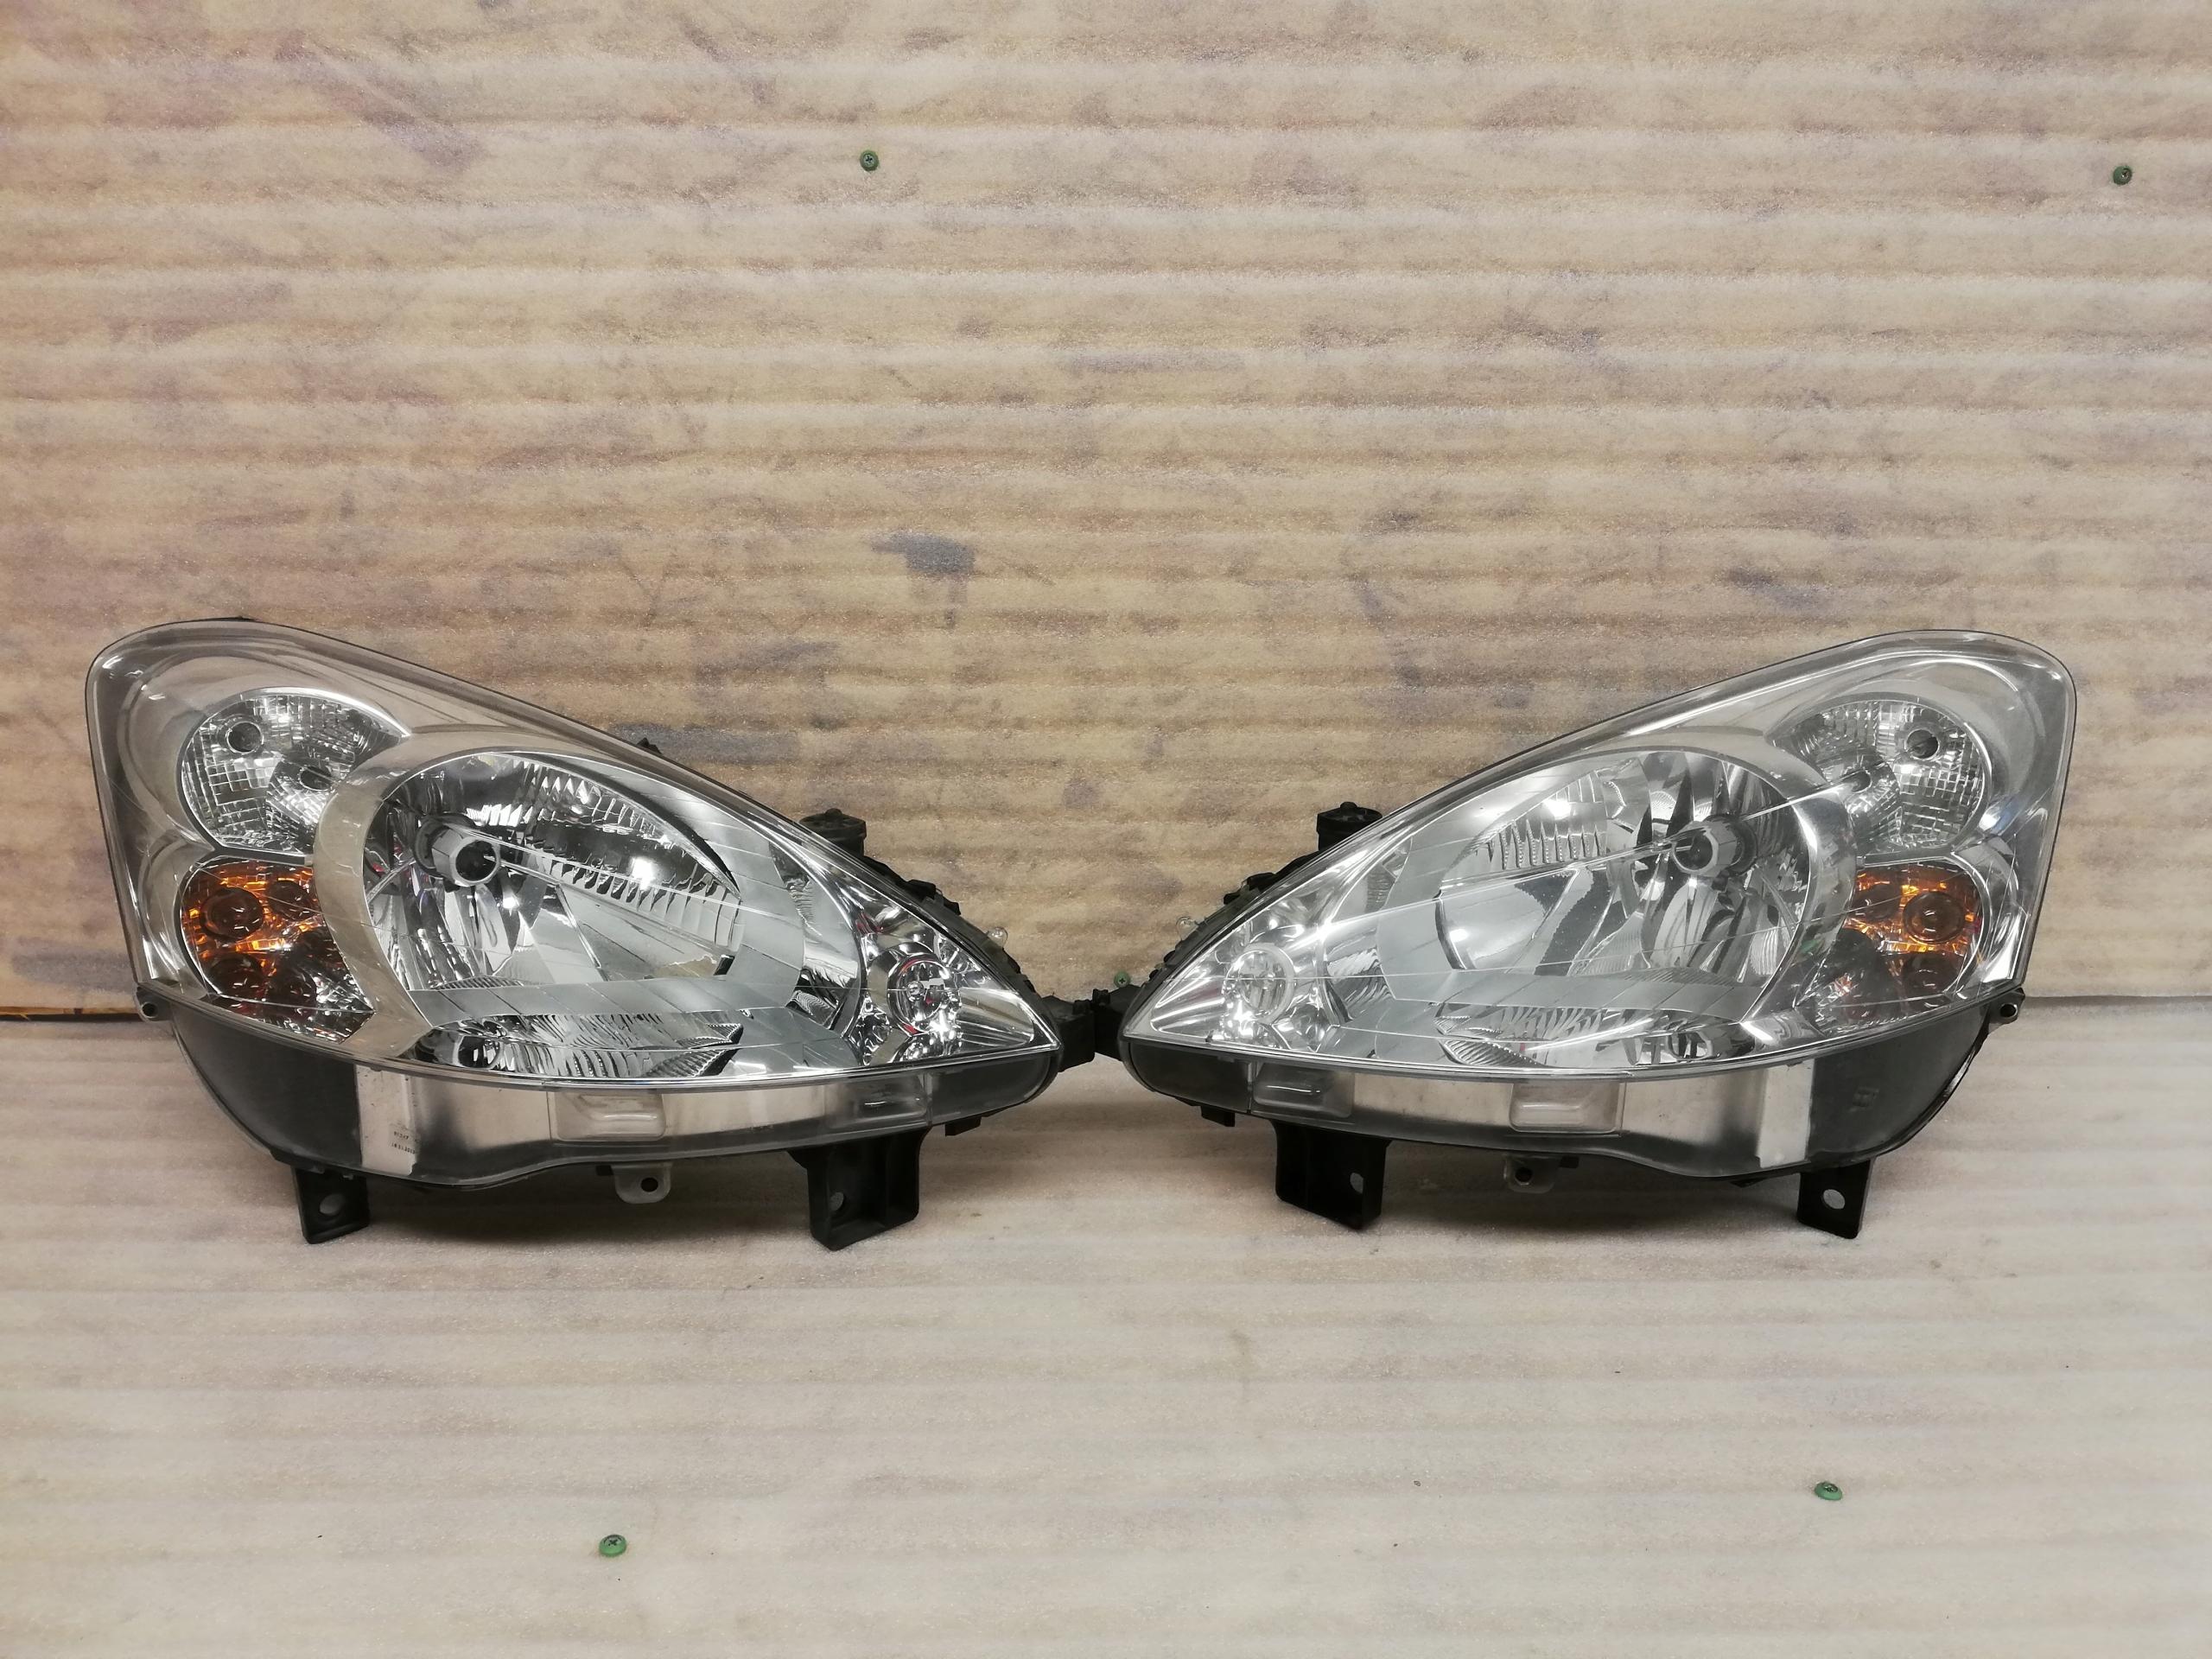 Komplet Lamp Peugeot Partner Iii Demontaż 7764397615